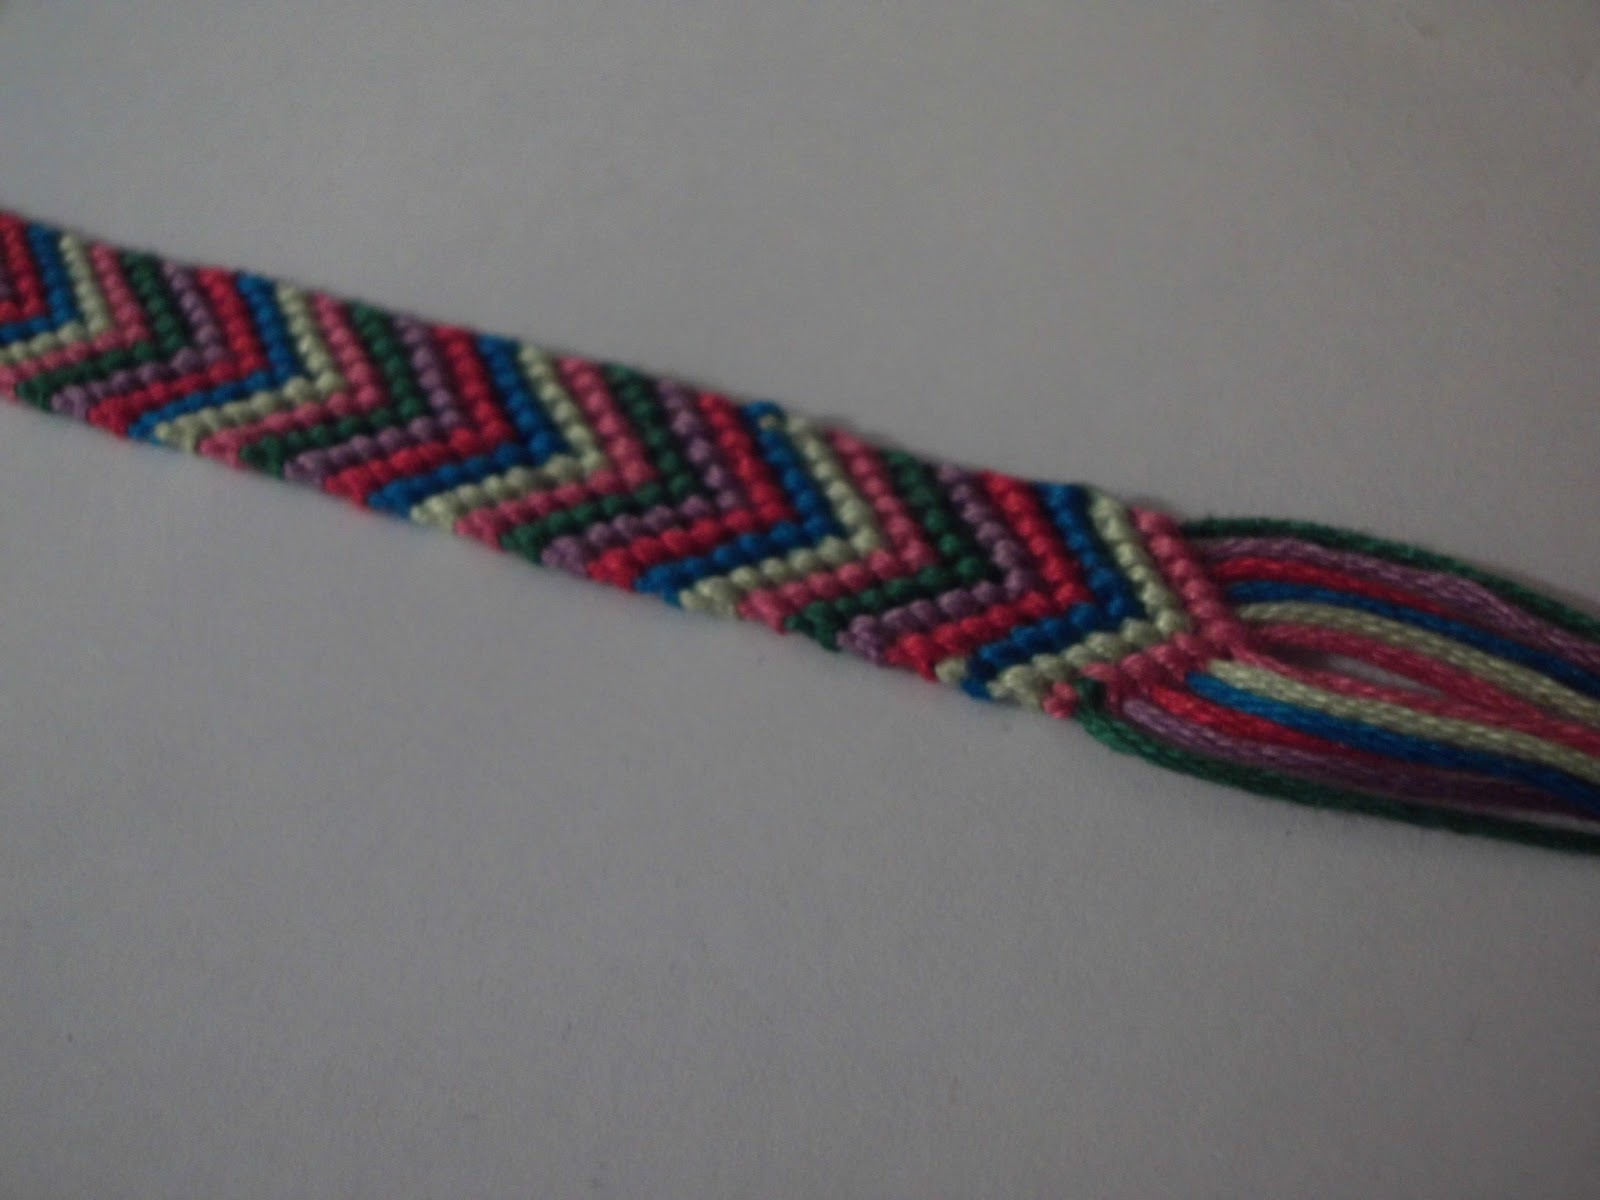 vovs jewellery blog chevron pattern friendship bracelet